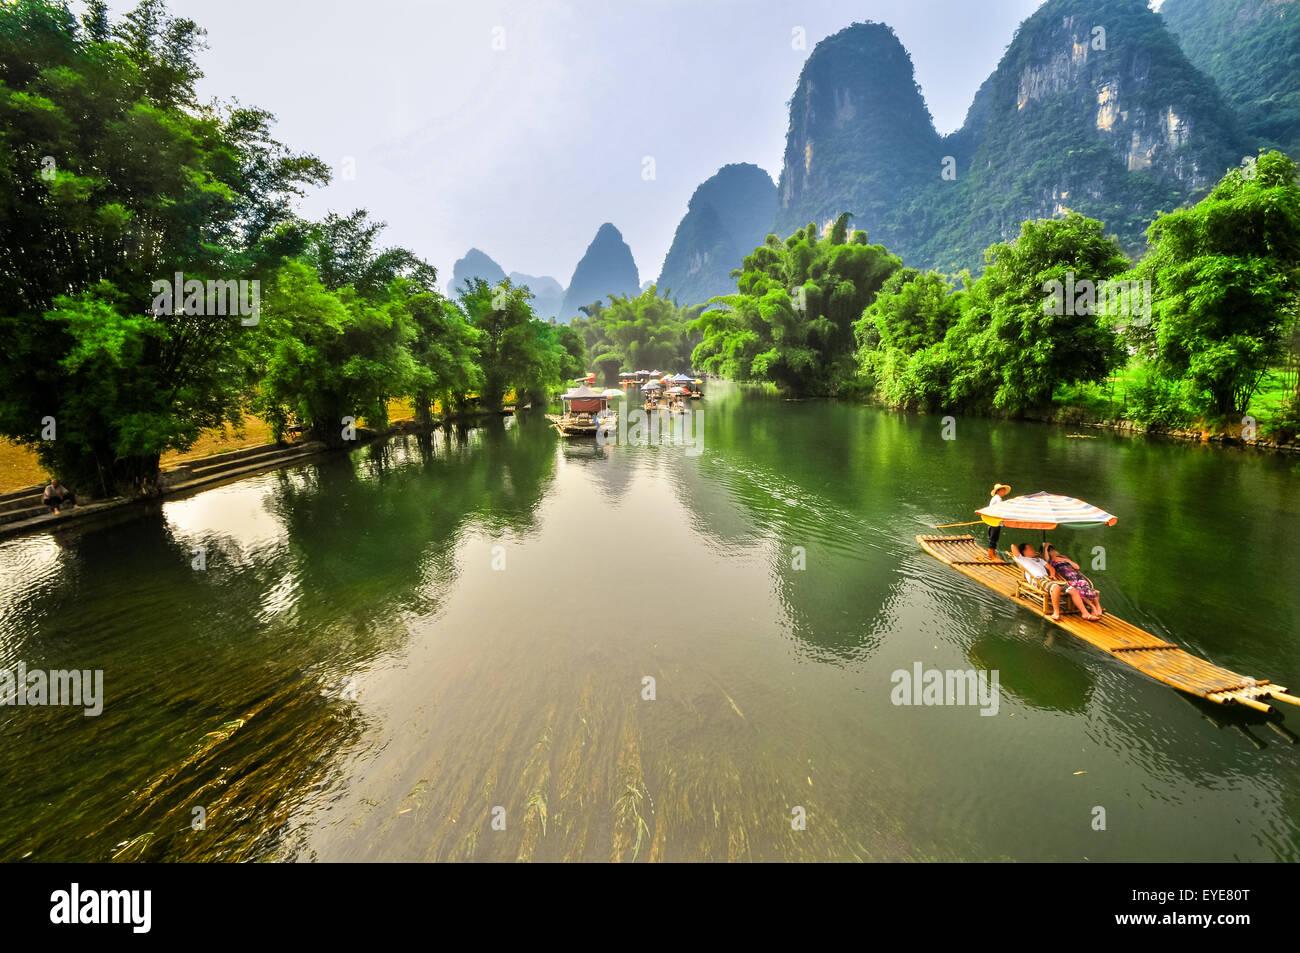 Beautiful Li river bamboo side Karst mountain landscape in Yangshuo Guilin, China Stock Photo